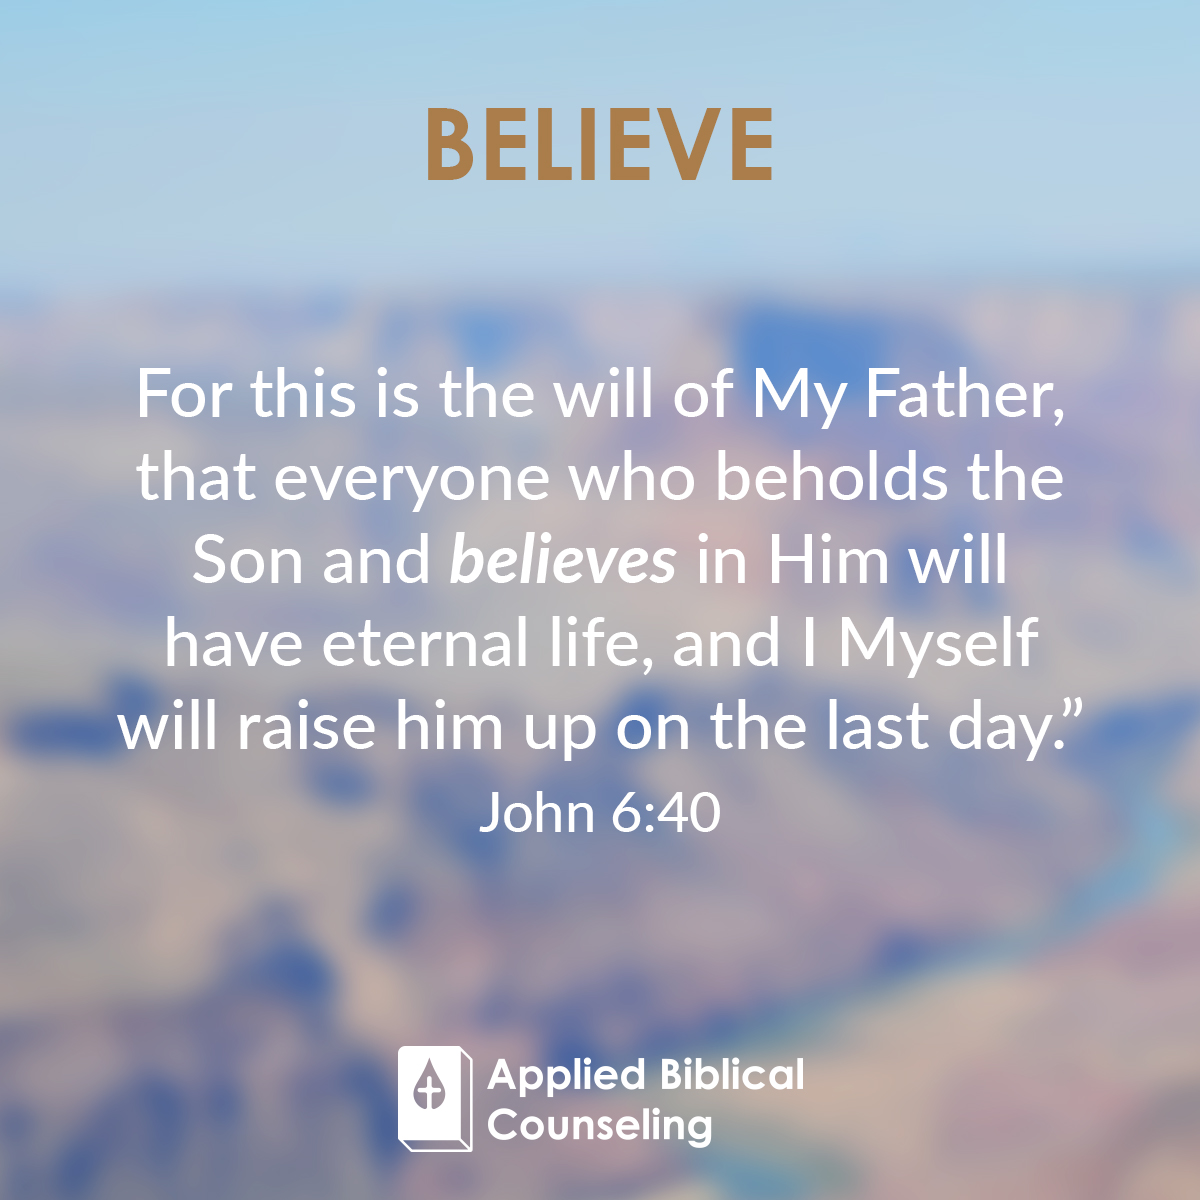 applied biblical counseling facebook w17 believe 4